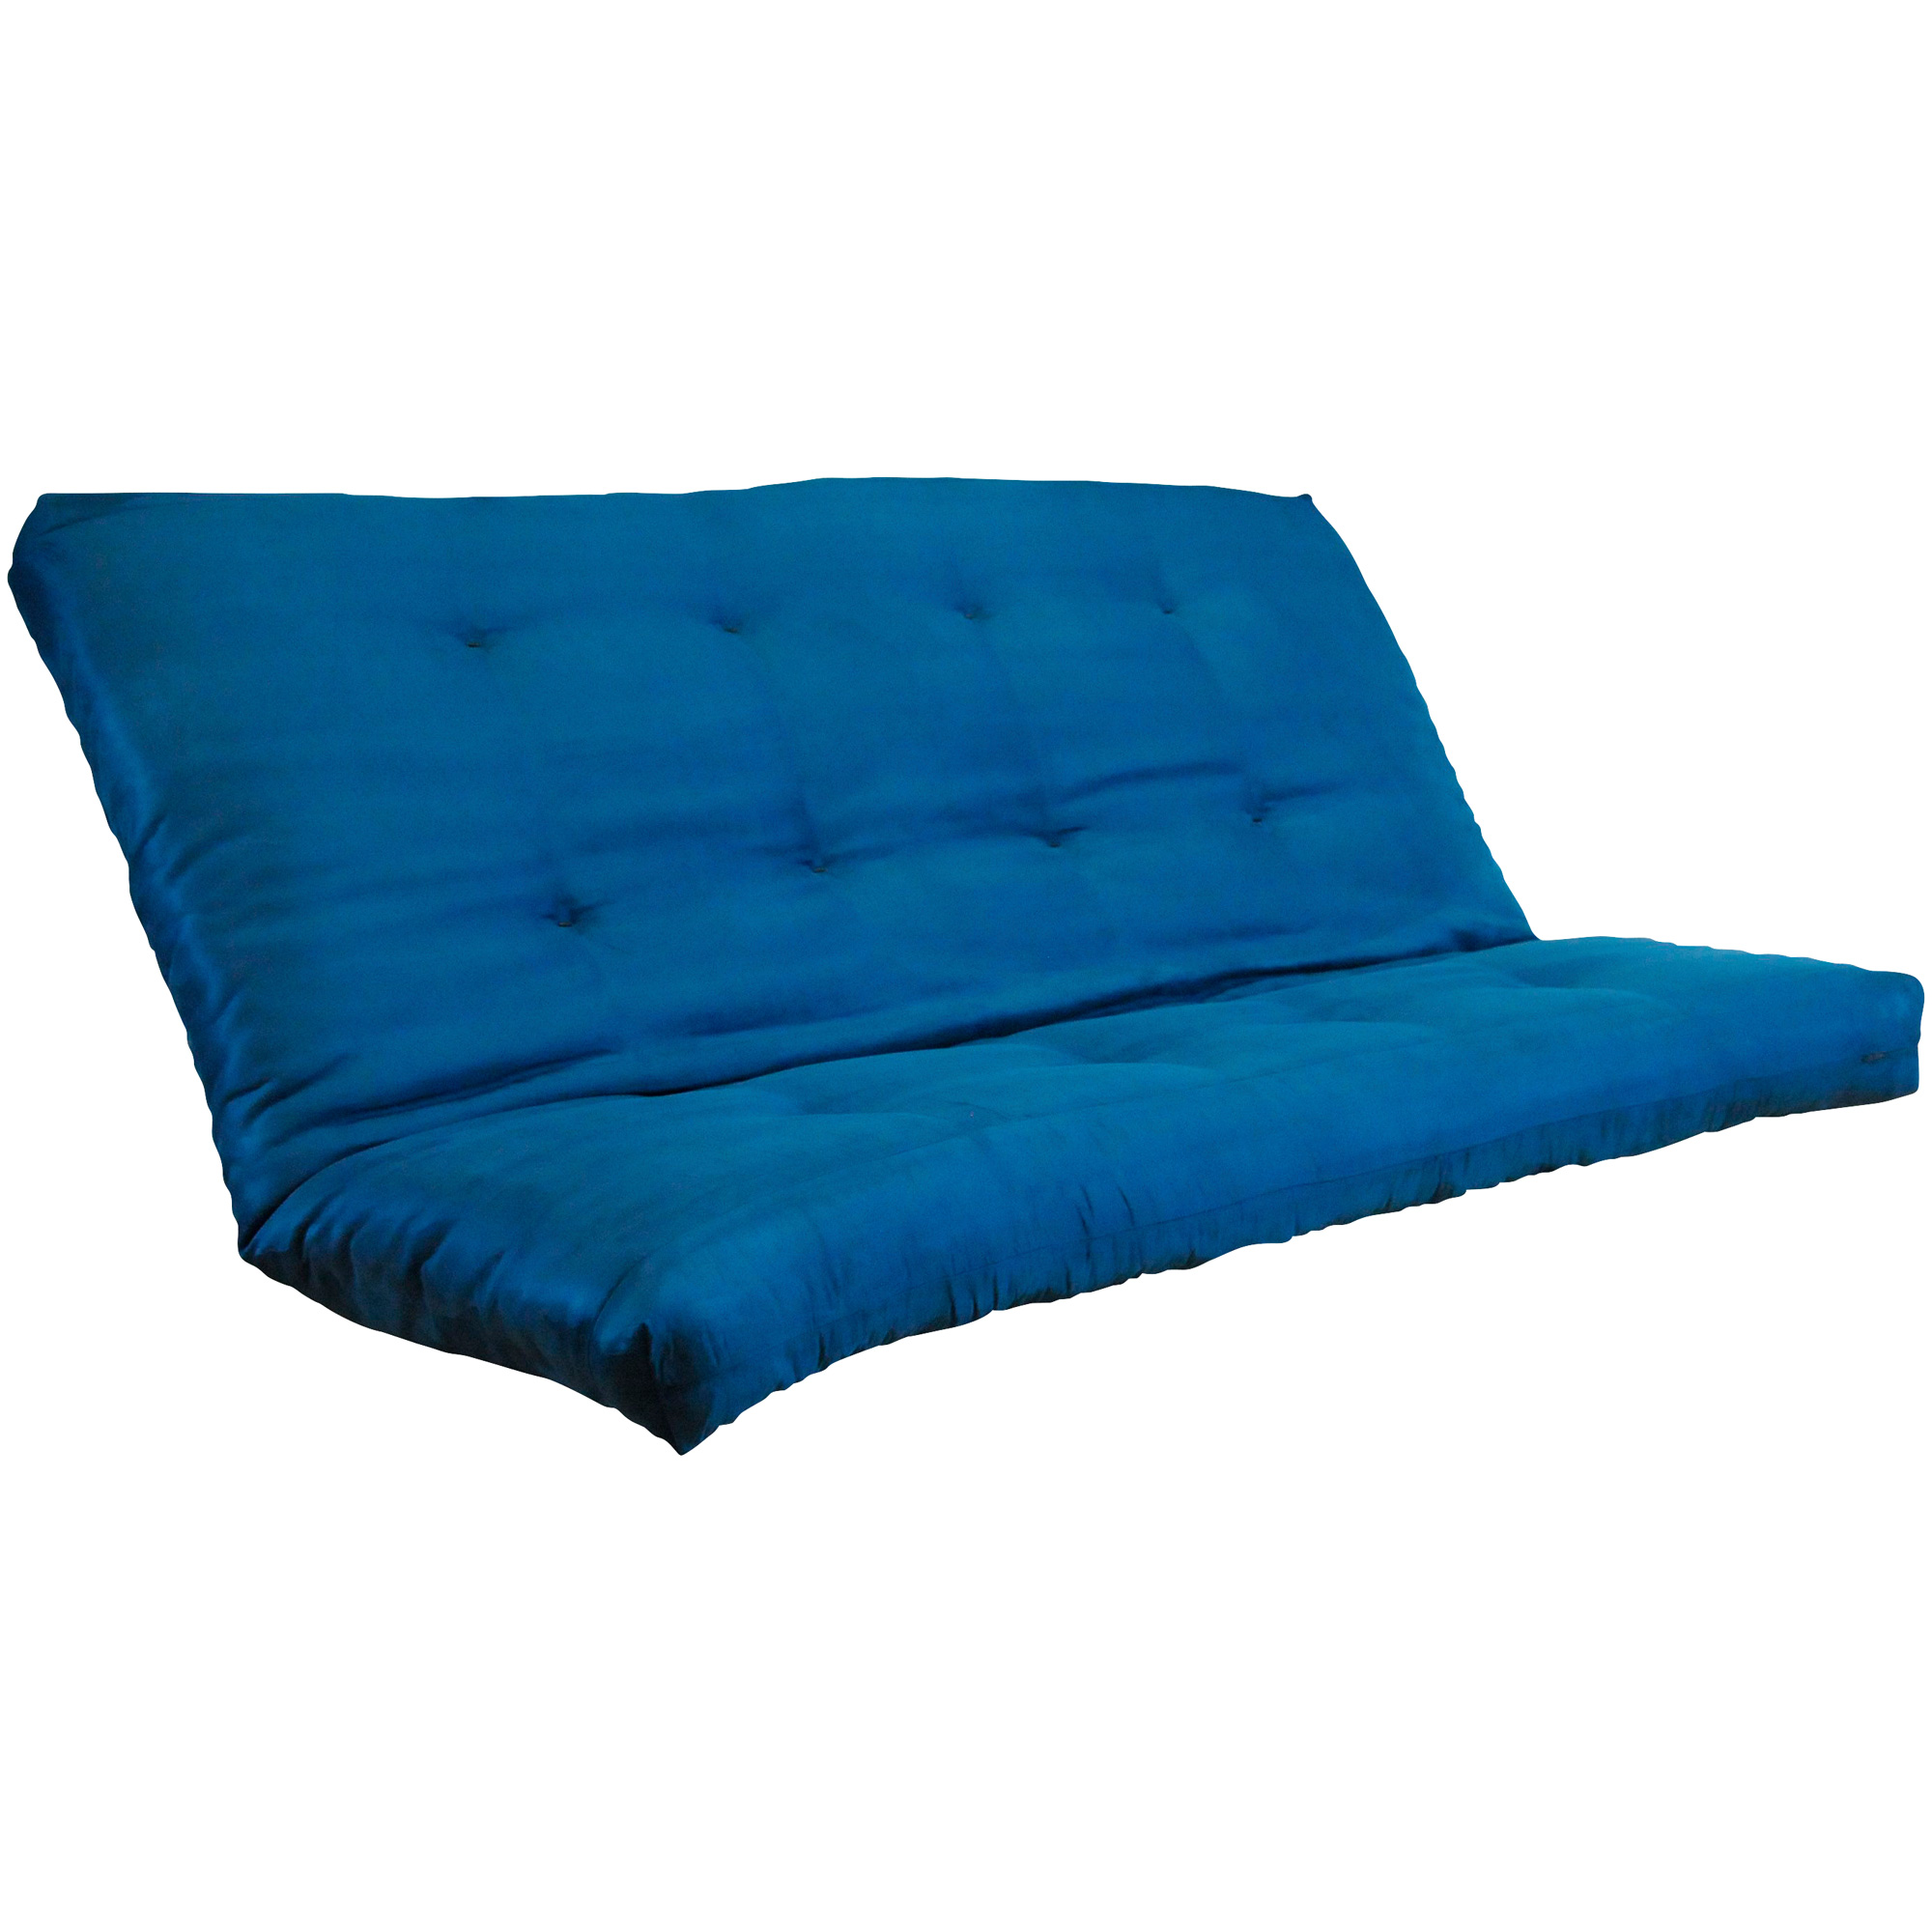 Kodiak Furniture | Microsuede Navy Queen Futon Mattress